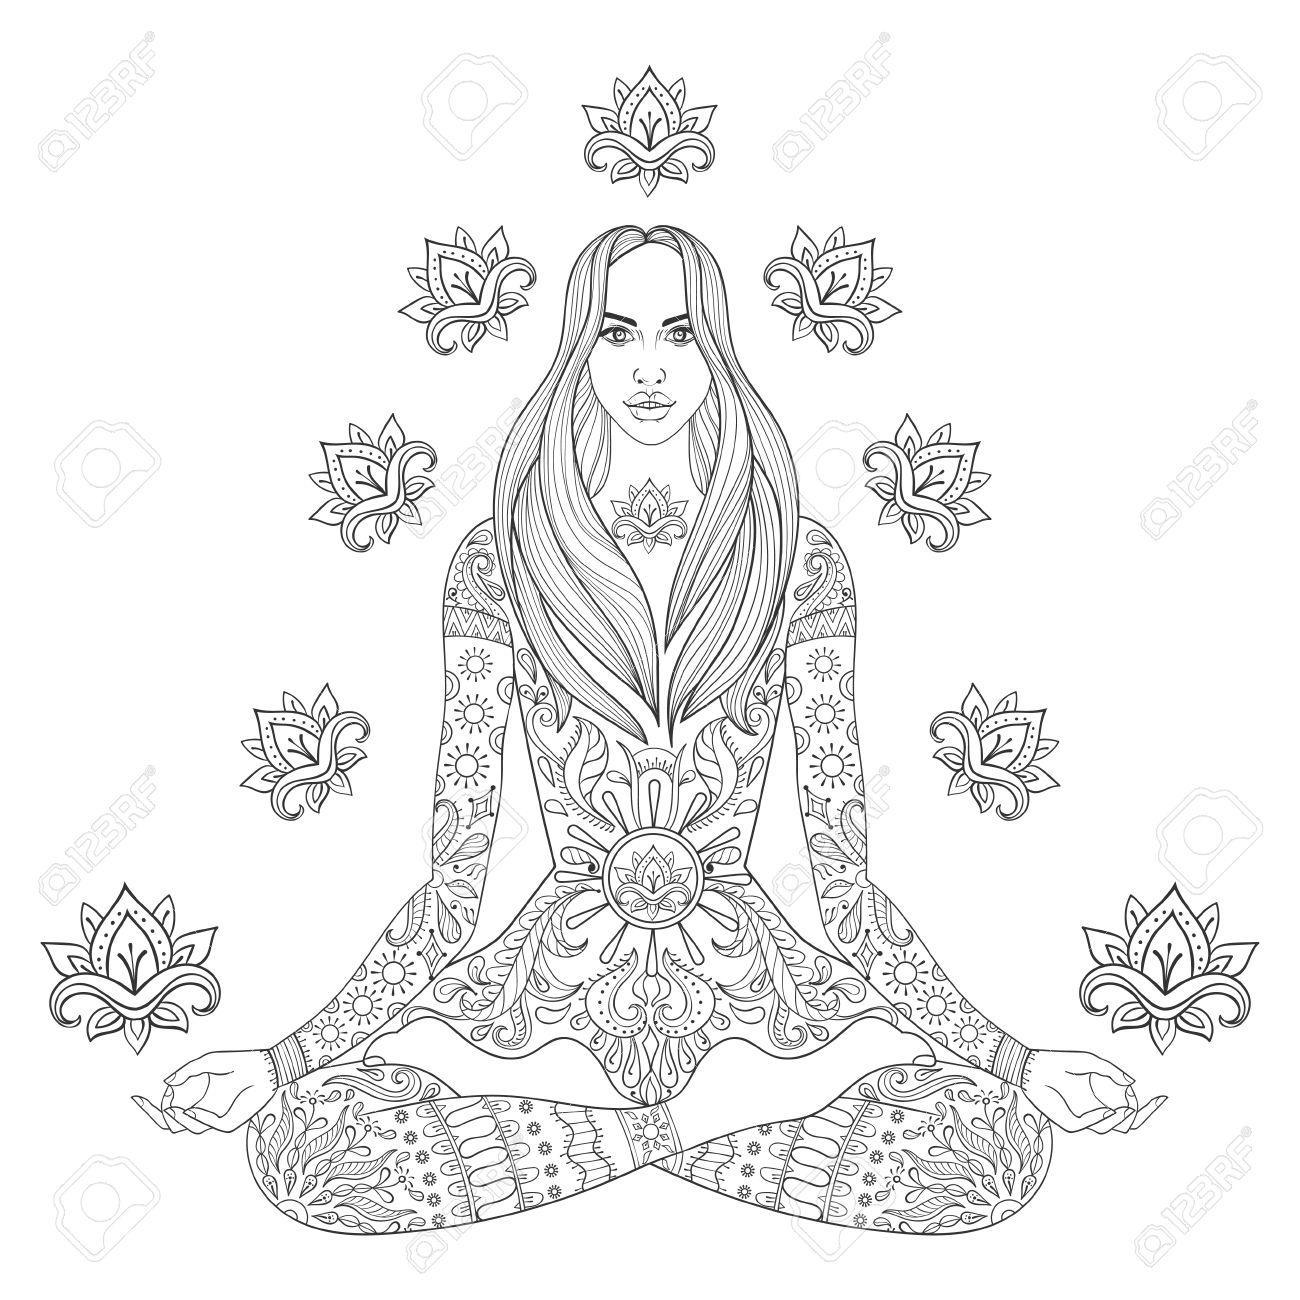 1300x1300 Meditating Beauyiful Girl Sitting In Lotus Pose. Vector Ornate